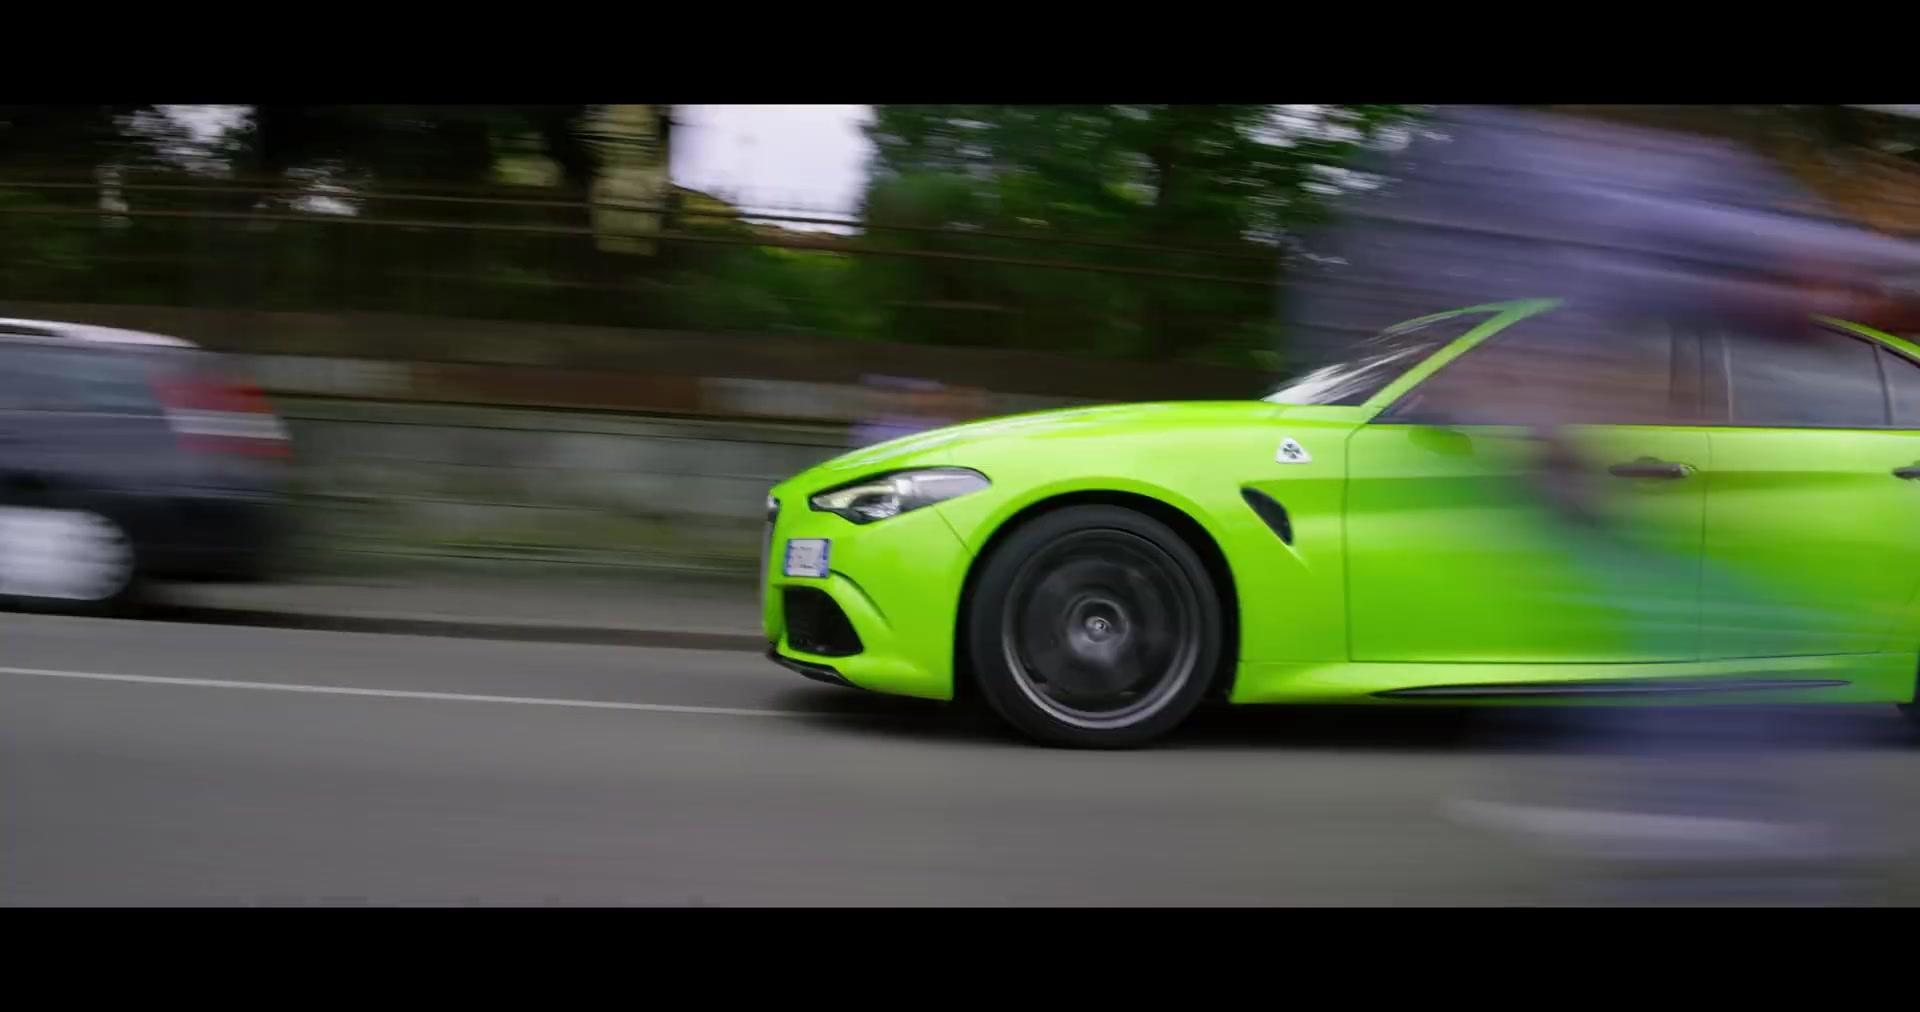 Alfa Romeo Giulia Neon Green Sports Car in 6 Underground